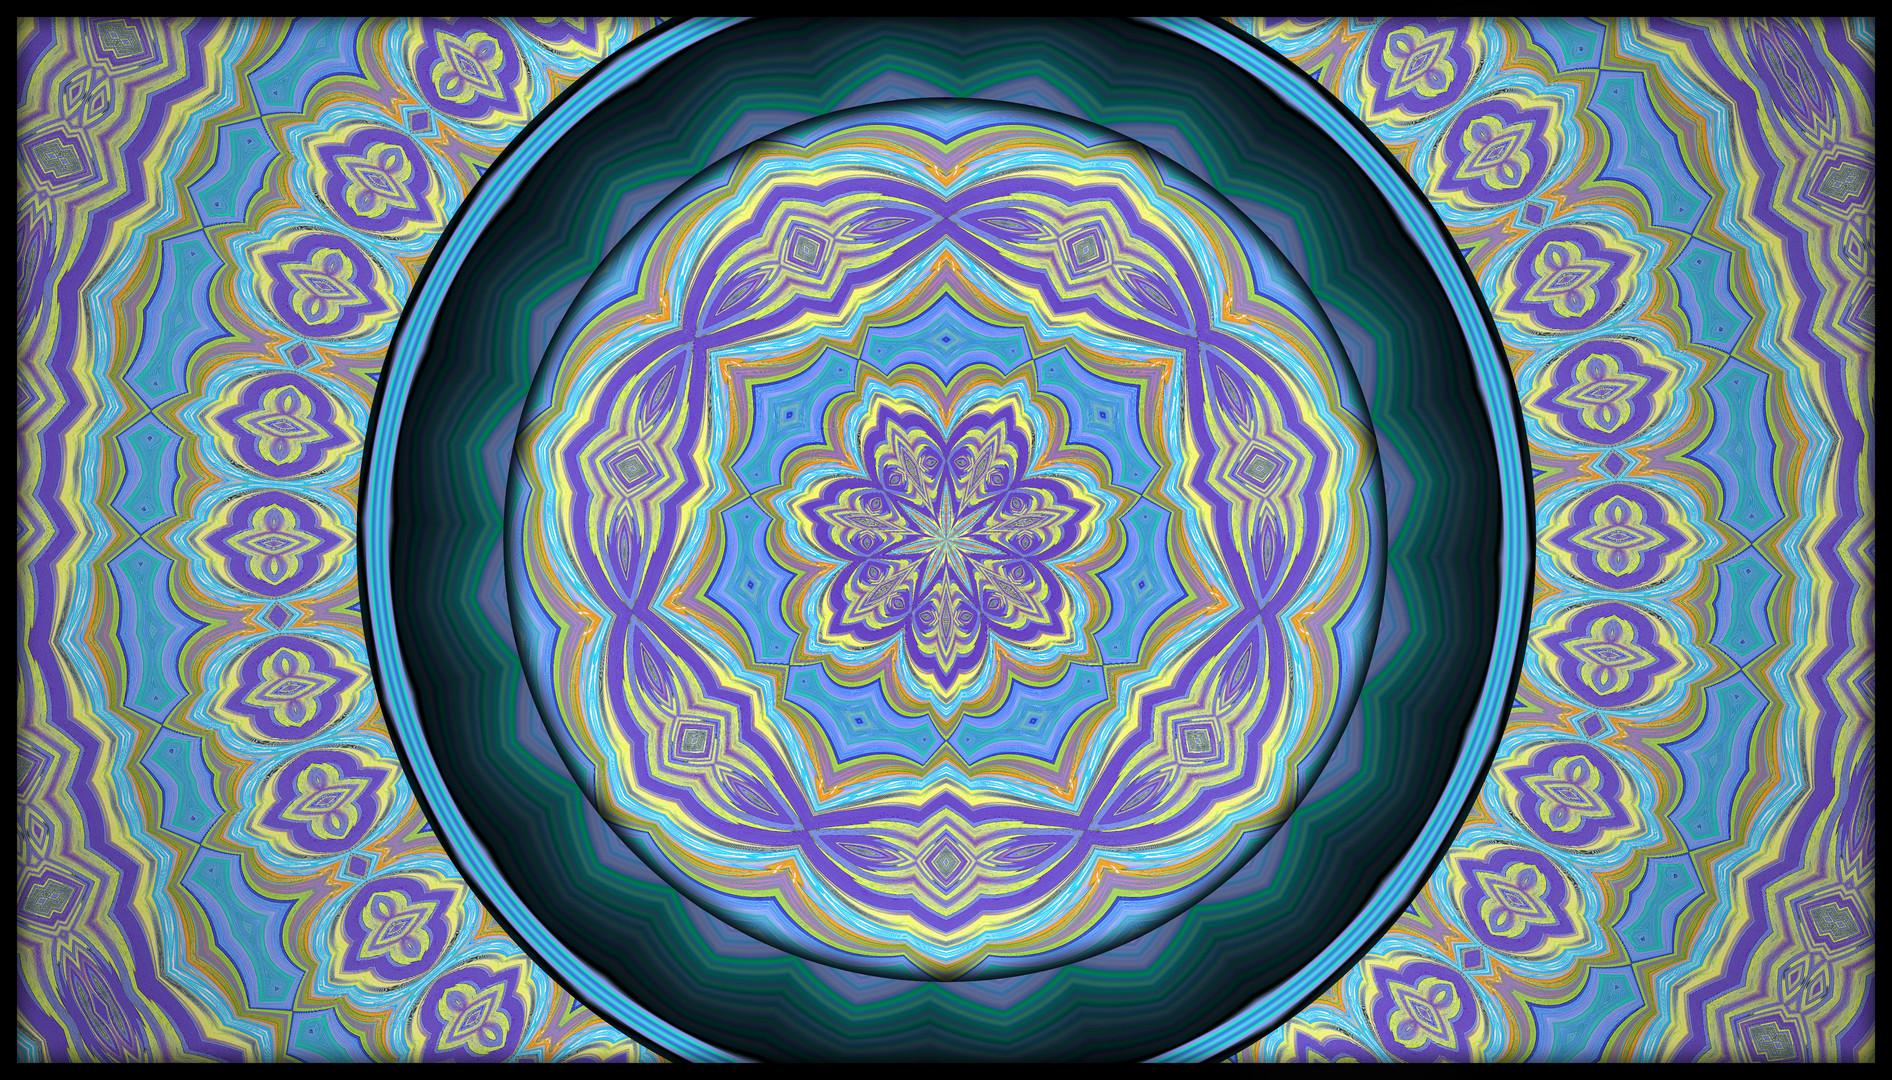 ... my graphic kaleidoscope